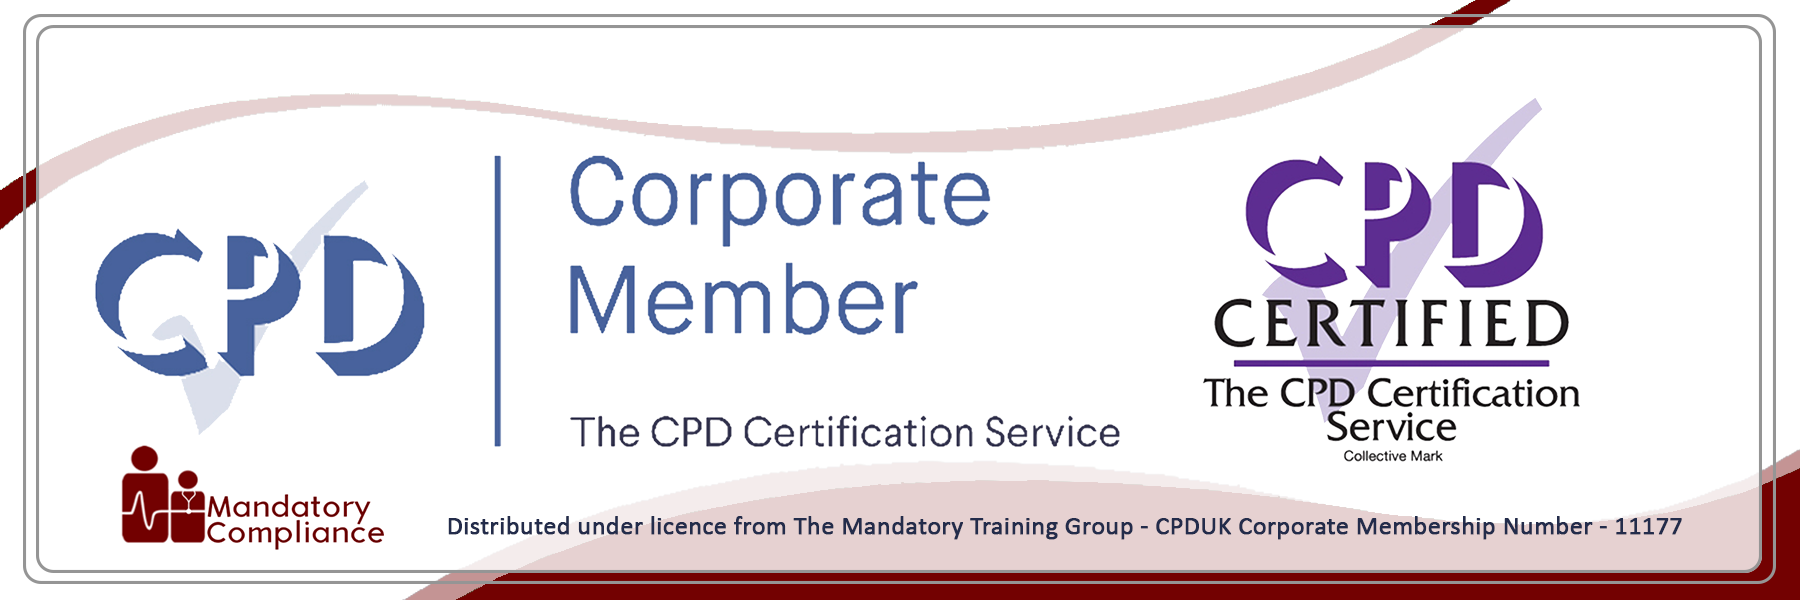 Coaching Mastery - E-Learning Package - CPDUK Accredited - Mandatory Compliance UK -